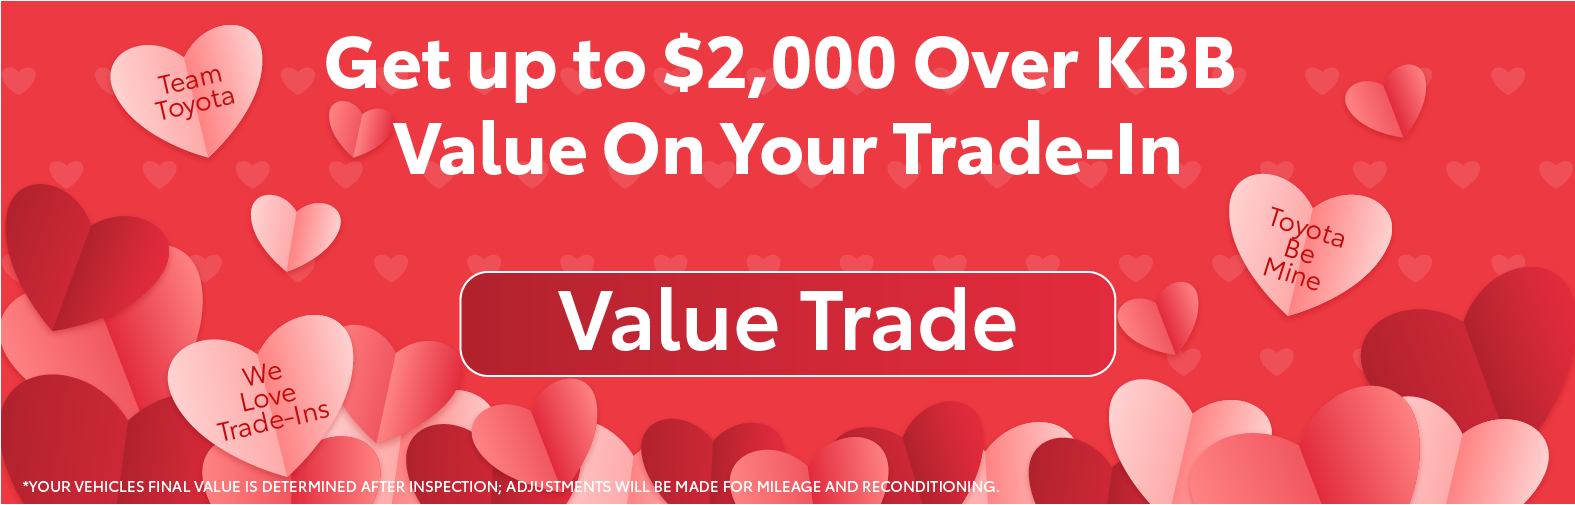 Trade-In_HomepageBanner_ValetinesTheme